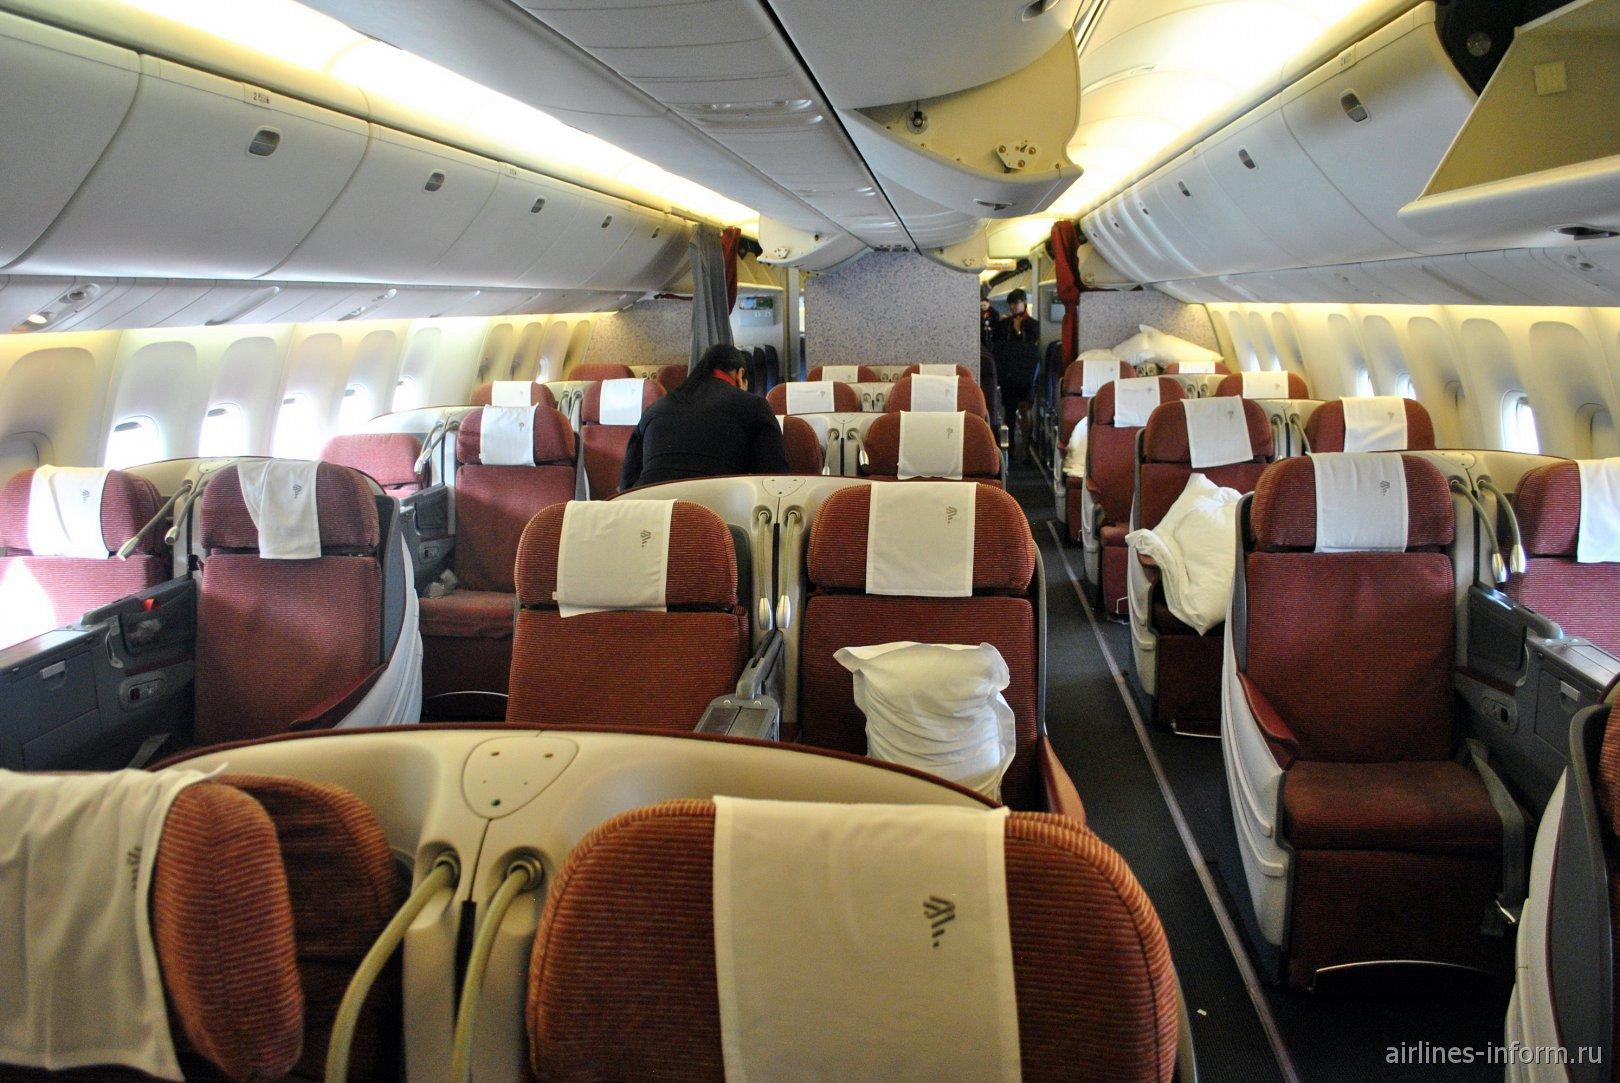 Пассажирский салон бизнес-класса в Боинге-767-300 авиакомпании LATAM Brasil